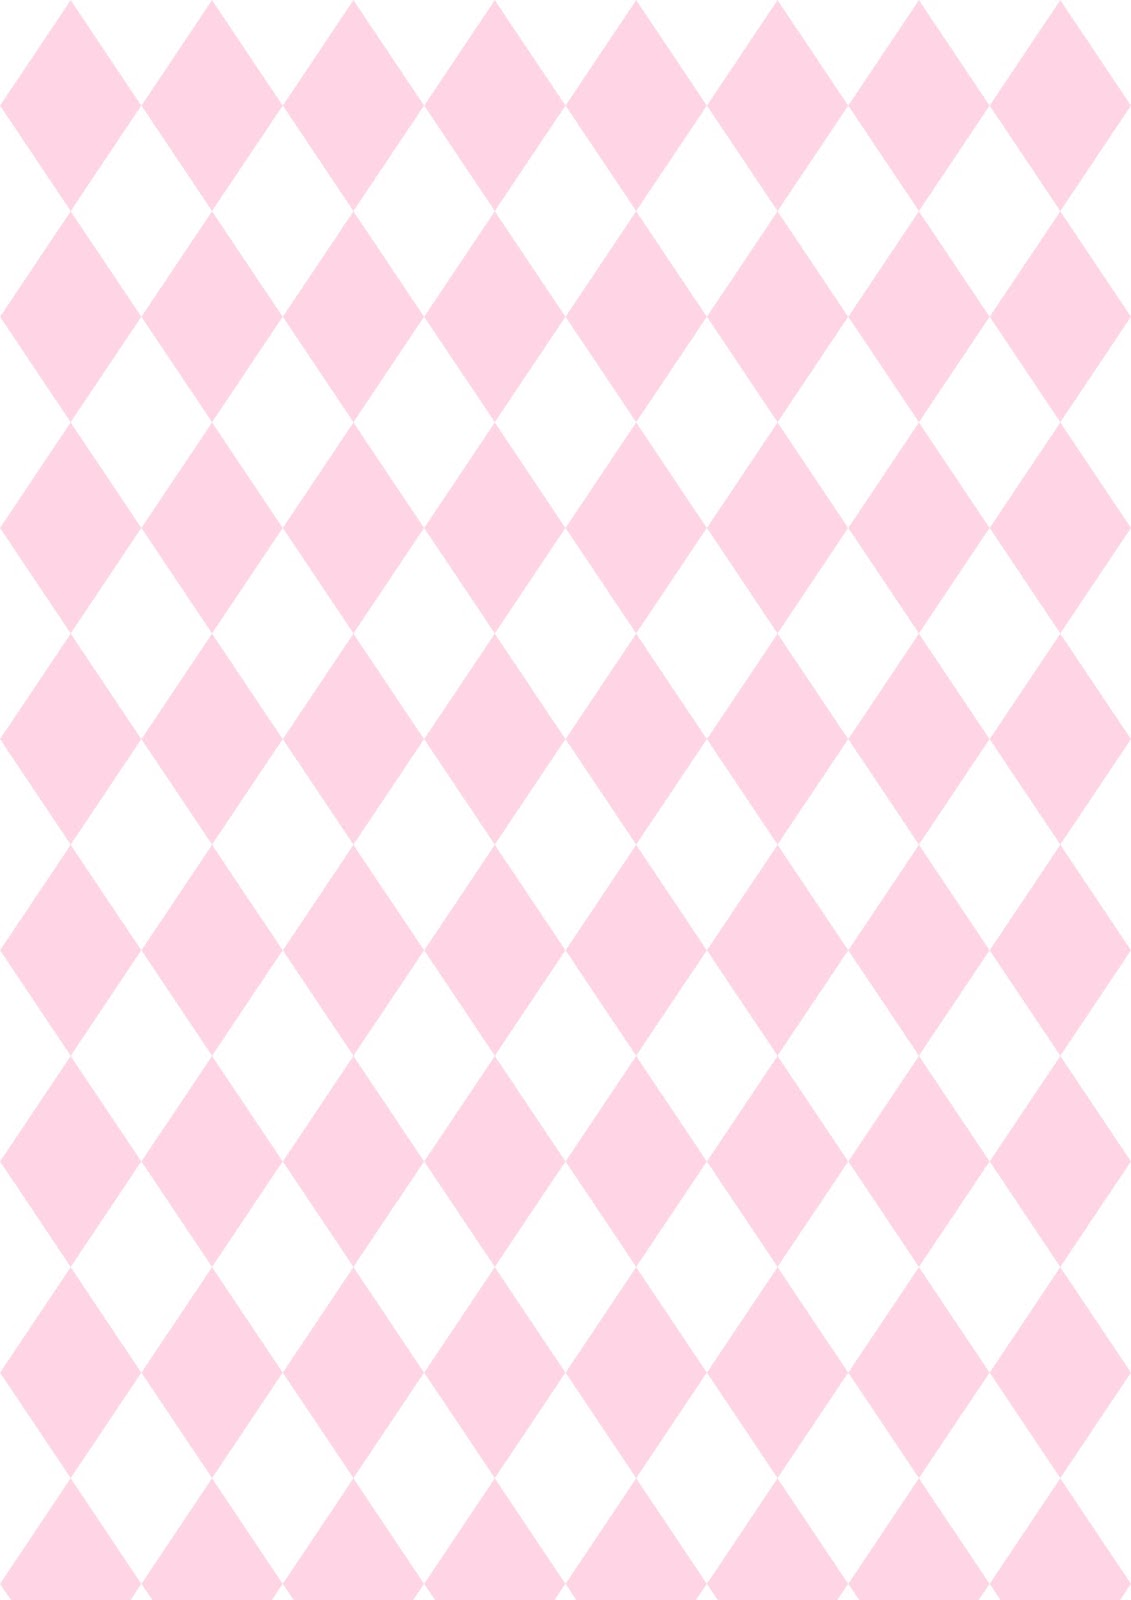 Free Digital Pink Harlequin Scrapbooking Paper